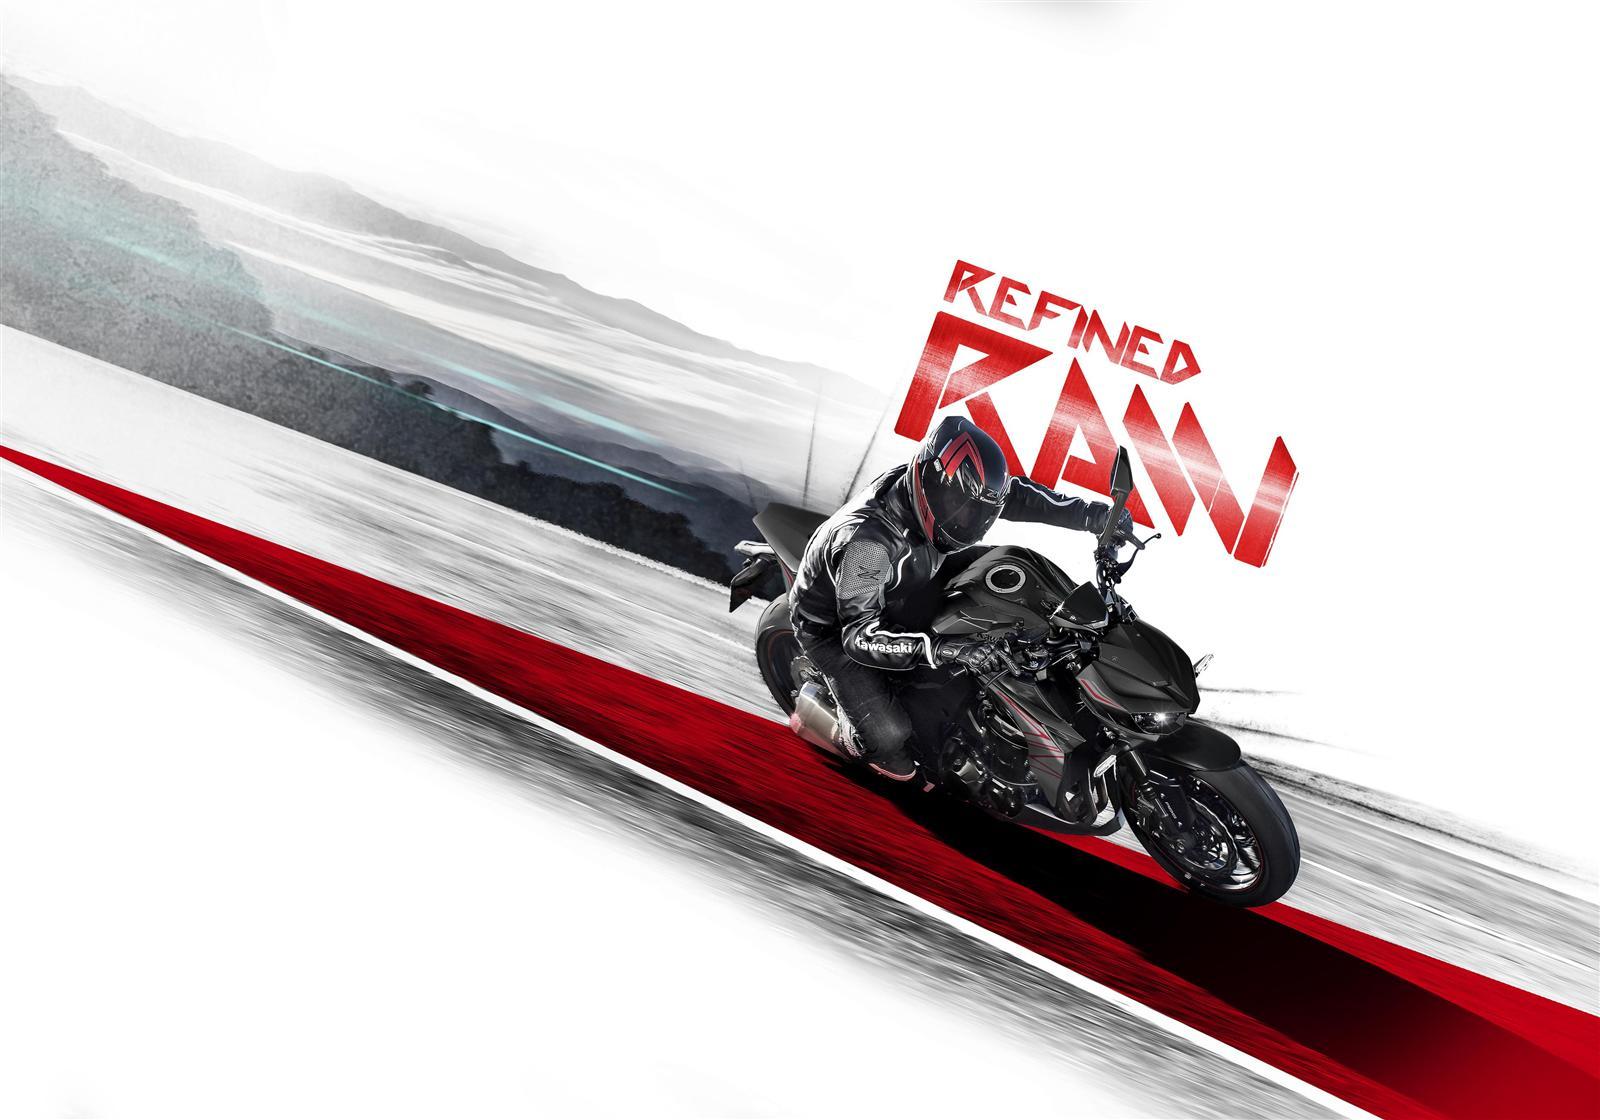 Kawasaki Z1000 2019 promo